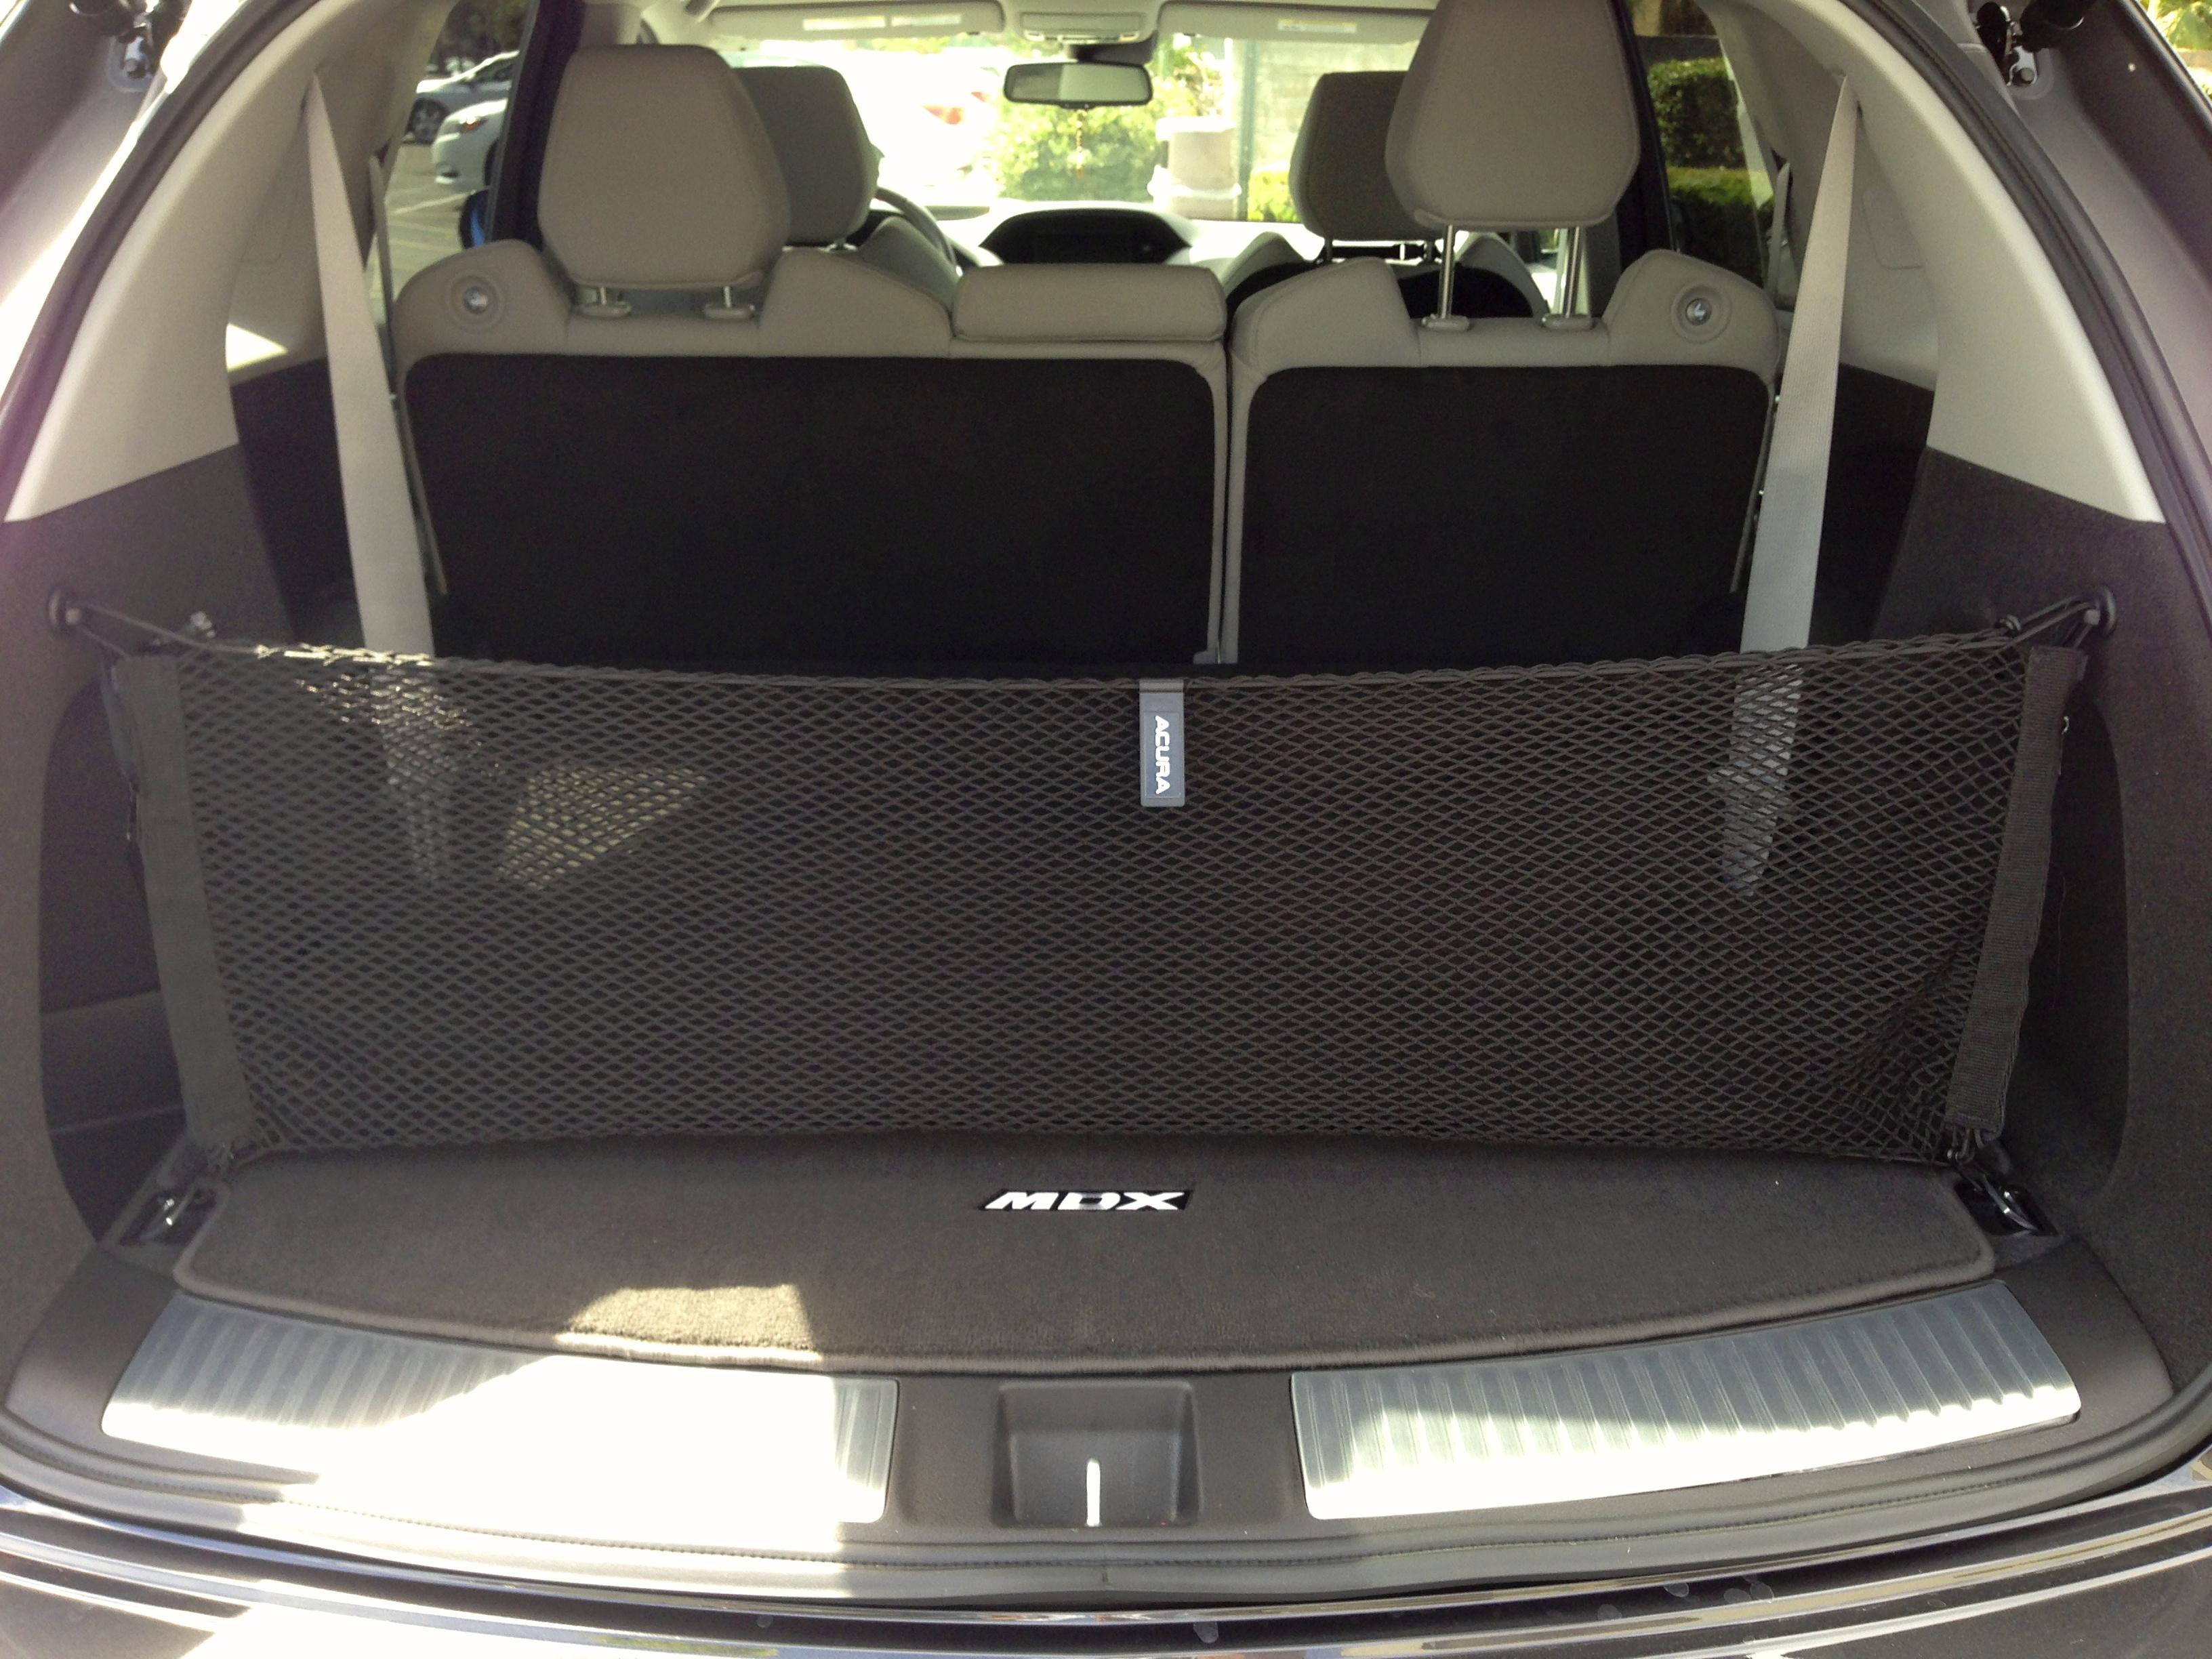 MDX Accessories Page Acura MDX Forum Acura MDX SUV Forums - Acura mdx accessories